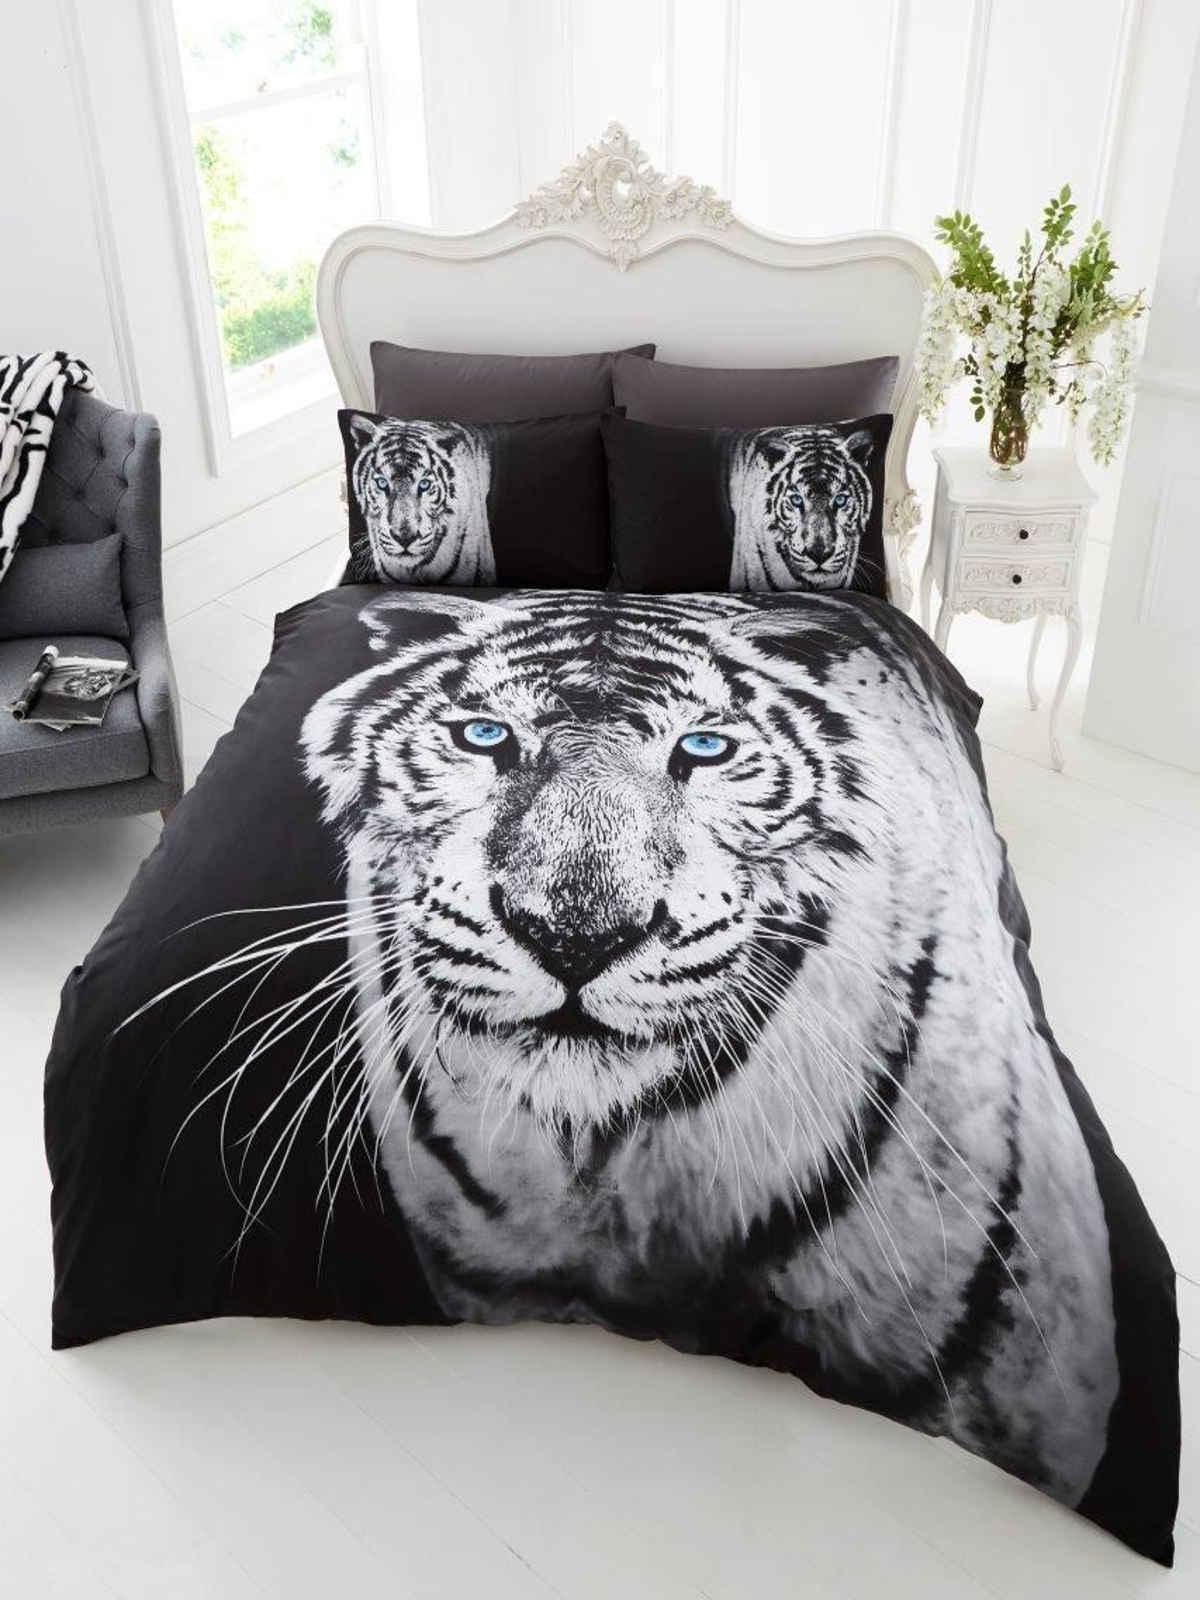 Wildlife Animal Print Duvet Cover Quilt Cover Bedding Sets Single Double King  eBay